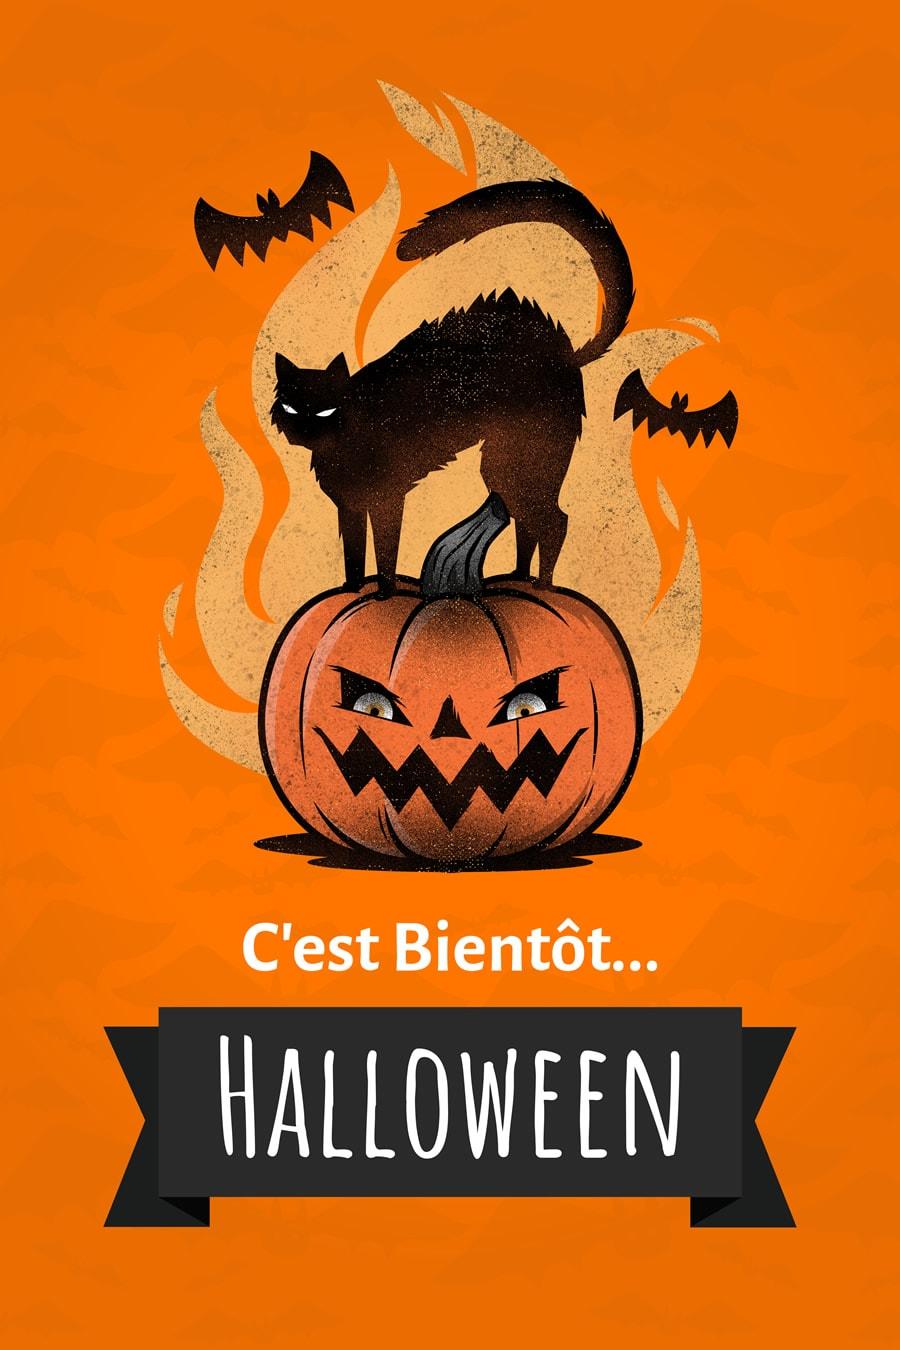 Bientôt Halloween image 1